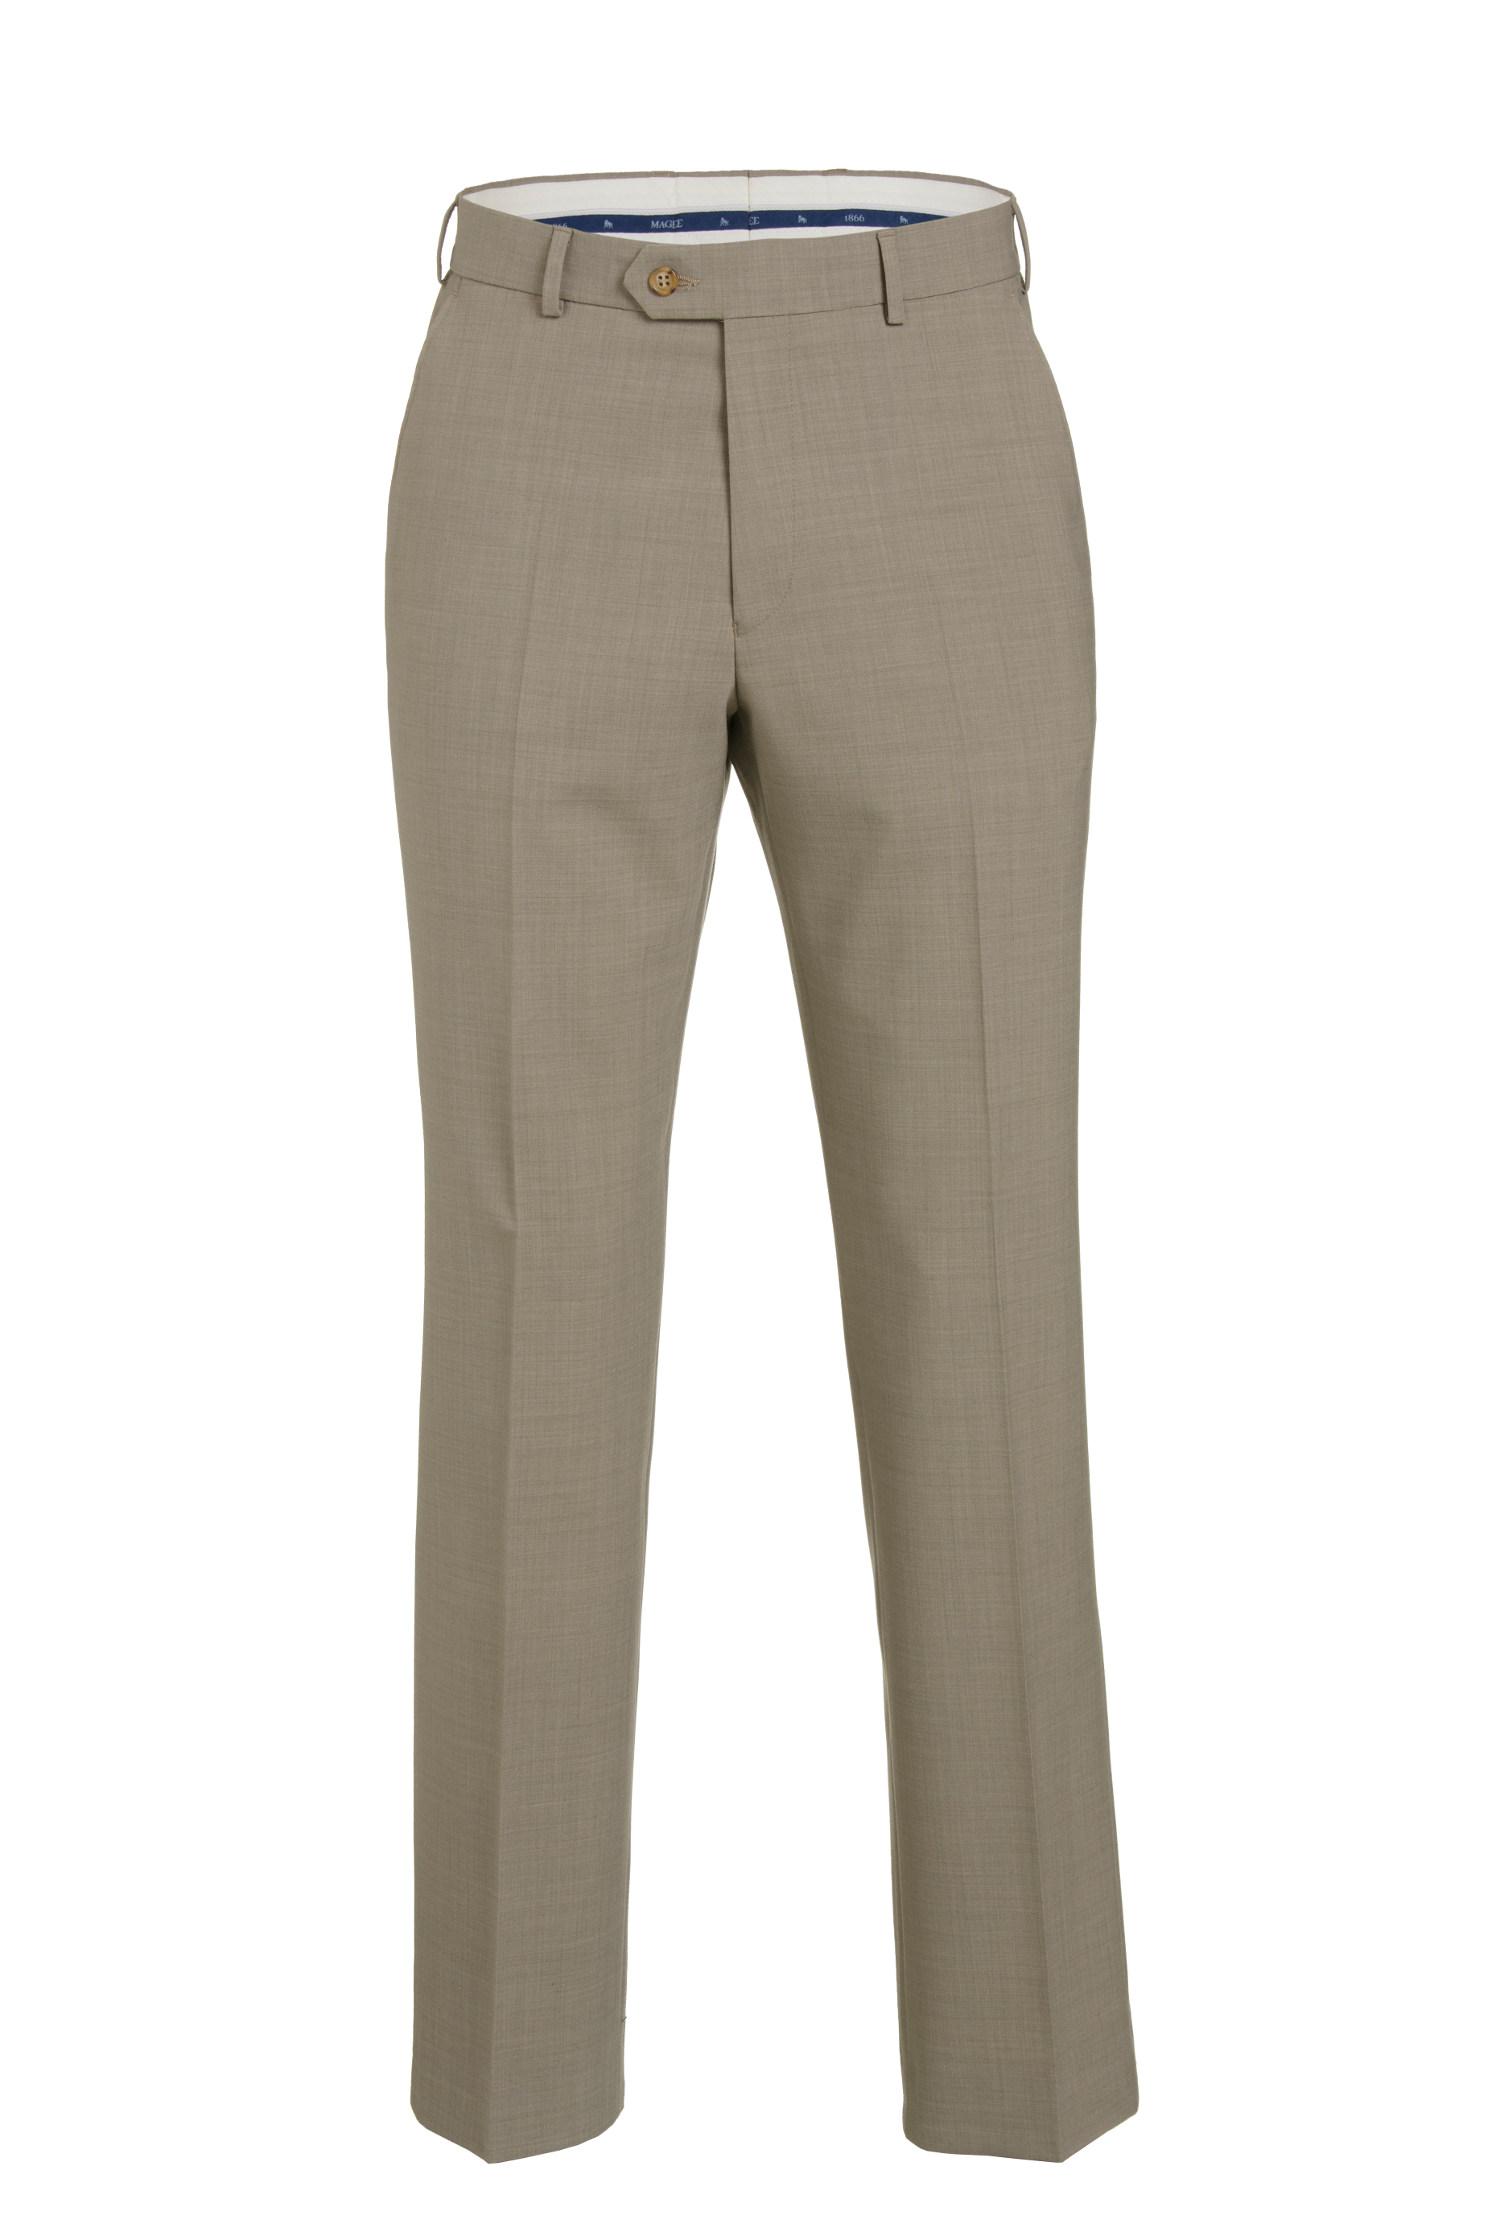 Beige Lightweight Summer Suit